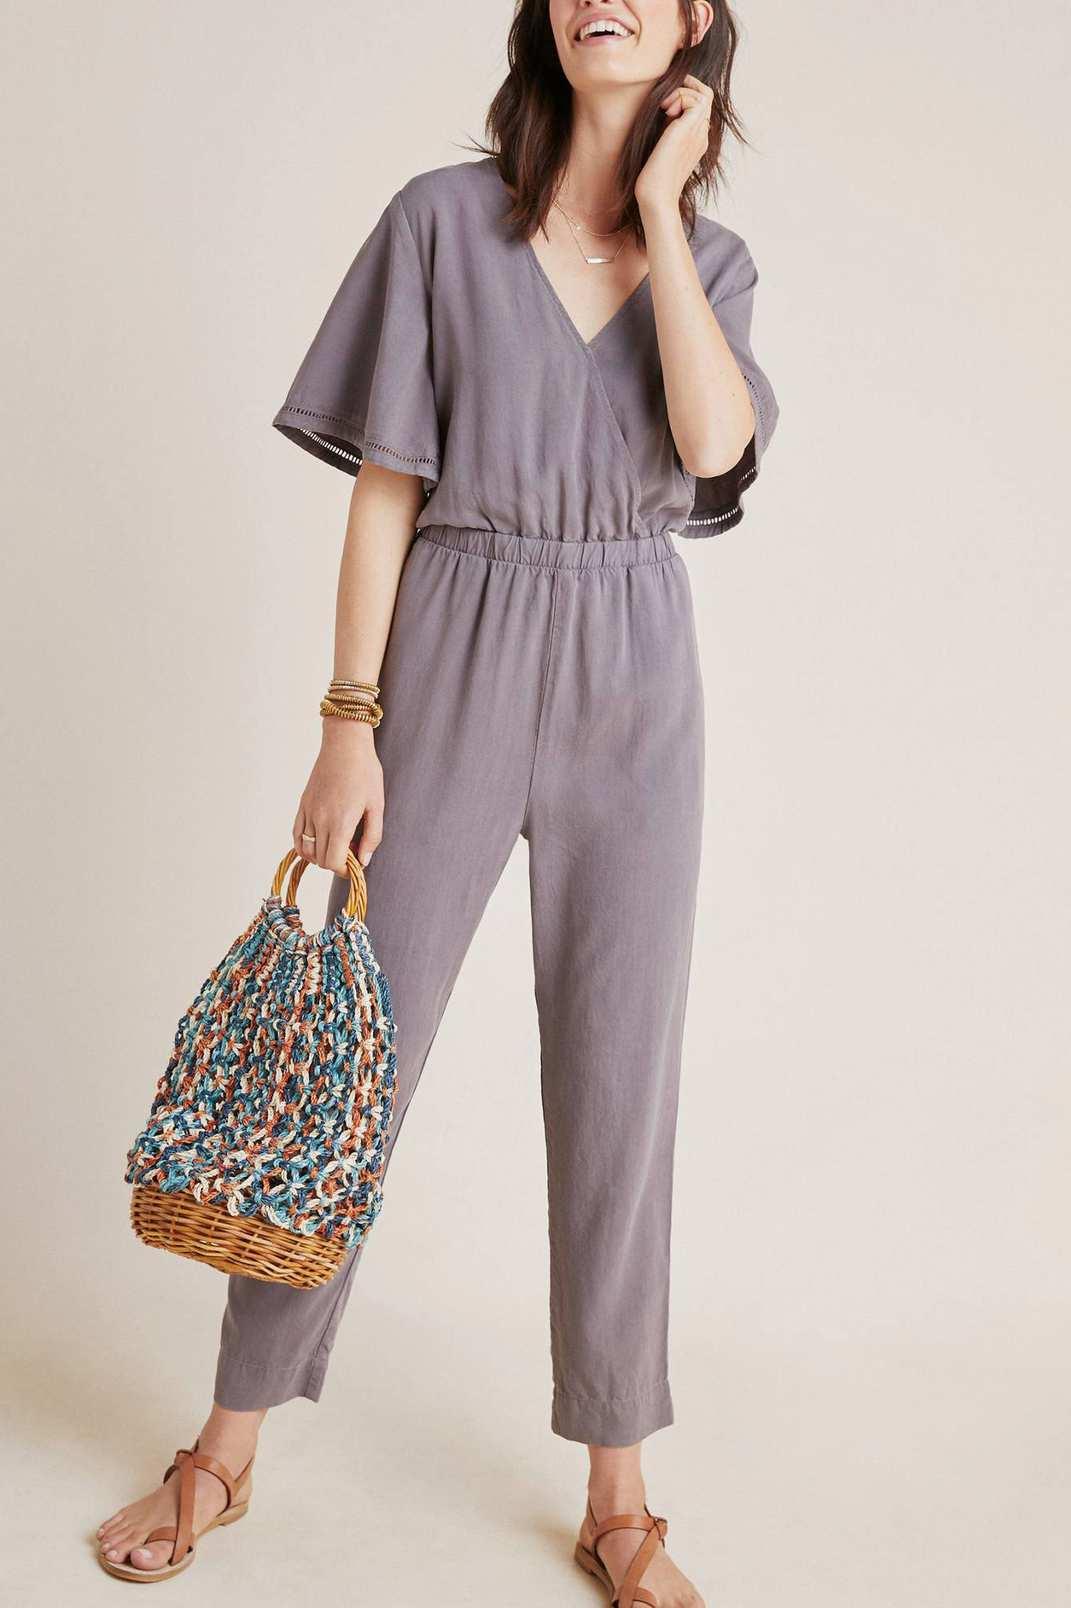 Anthropologie Cloth & Stone Gulpiyuri Jumpsuit